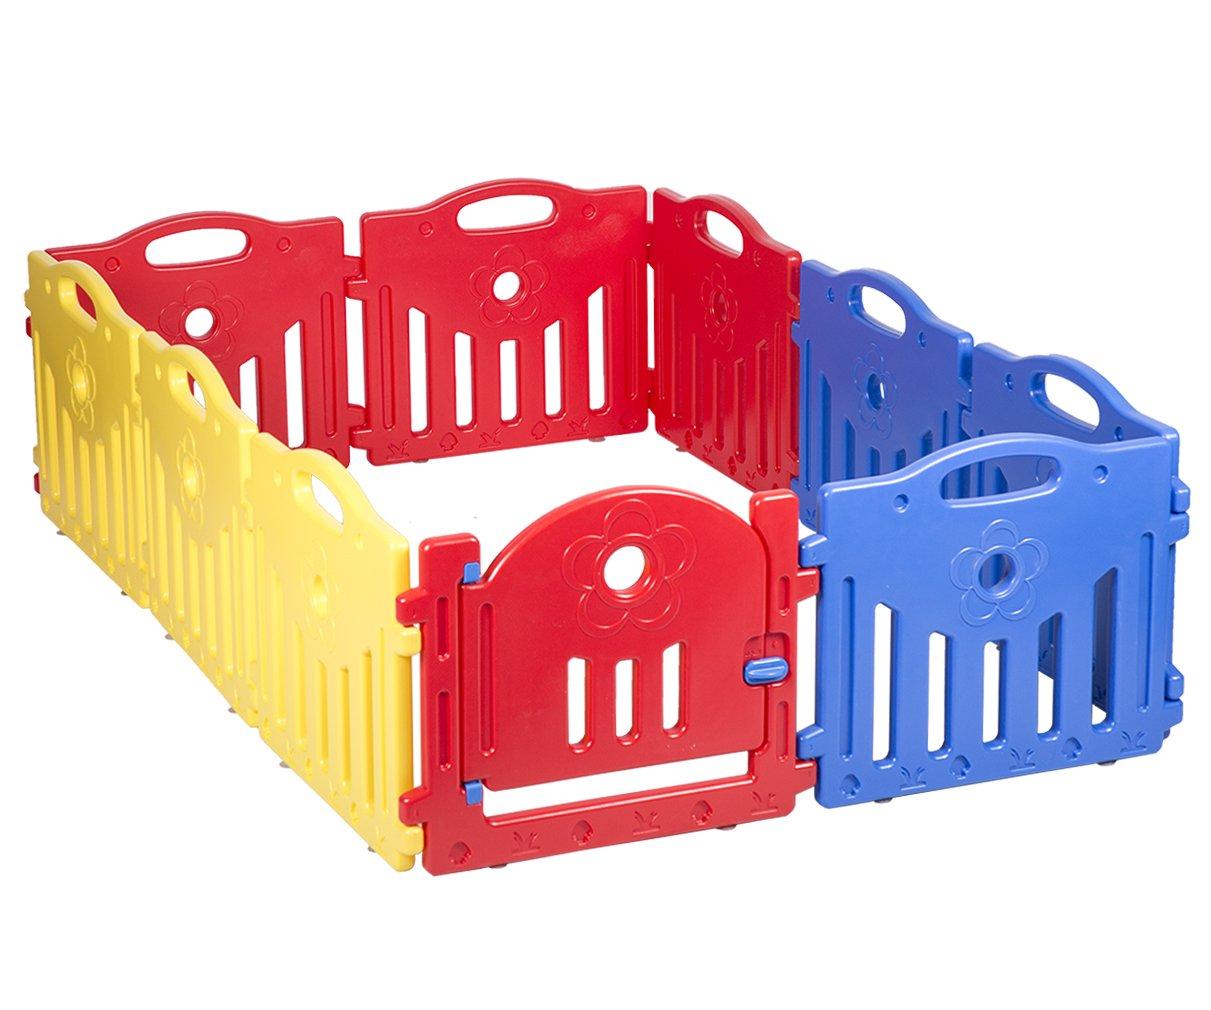 Baby Playpen PlaySafe Activity Center 10 Panel Adjustable Playard Kids w/Lock by FDW (Image #3)